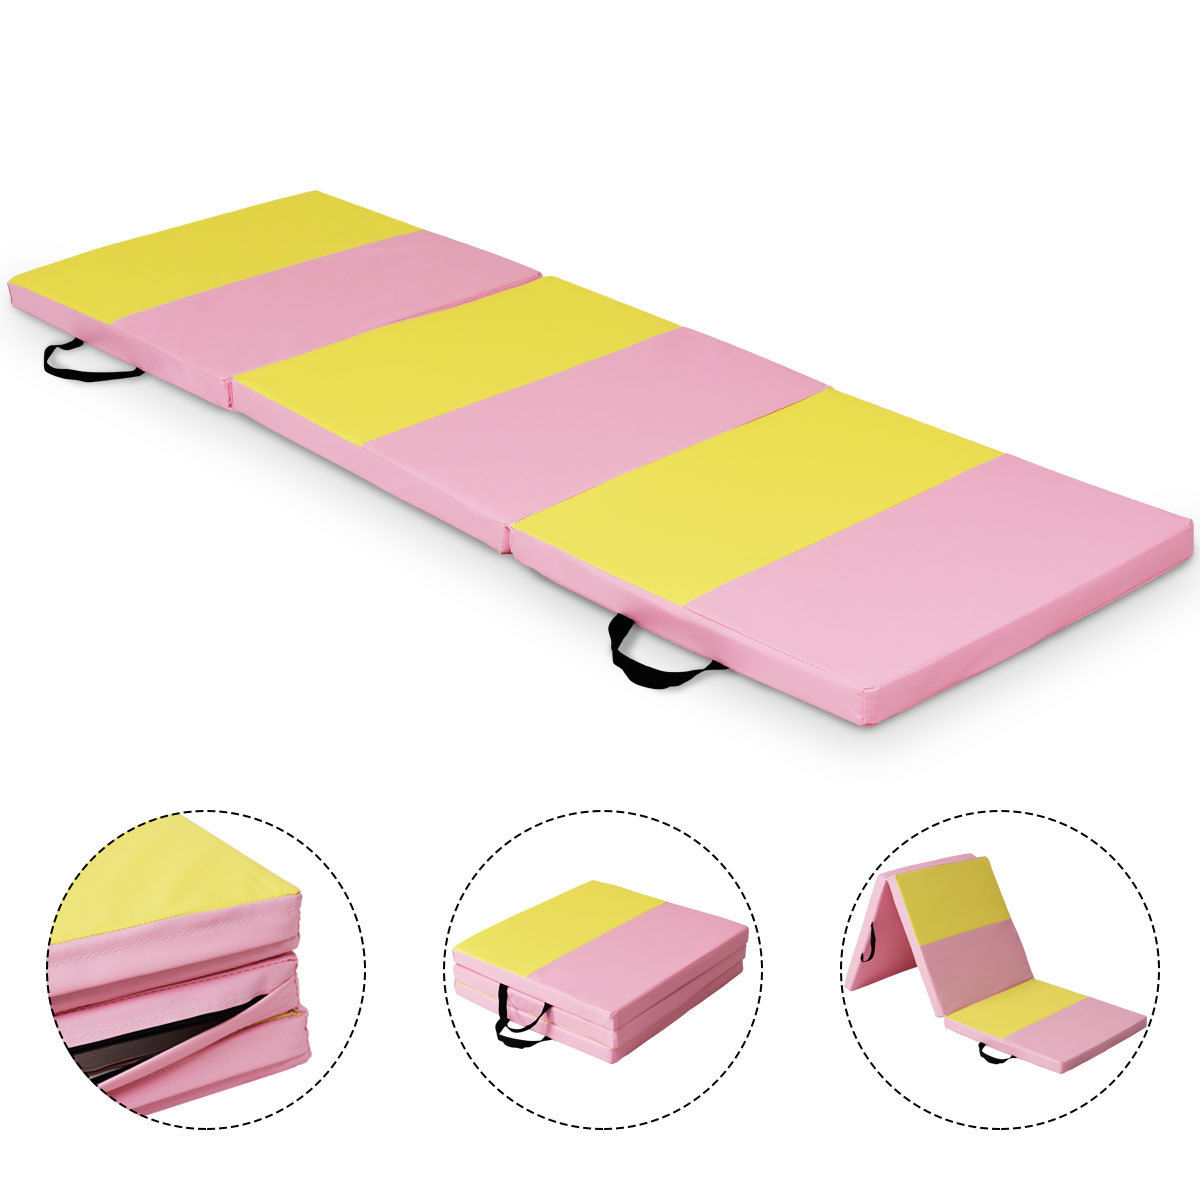 Costway Pink&Yellow Tri-Fold Gymnastics Mat 6'x2' Folding Fitness Exercise Carry Handles